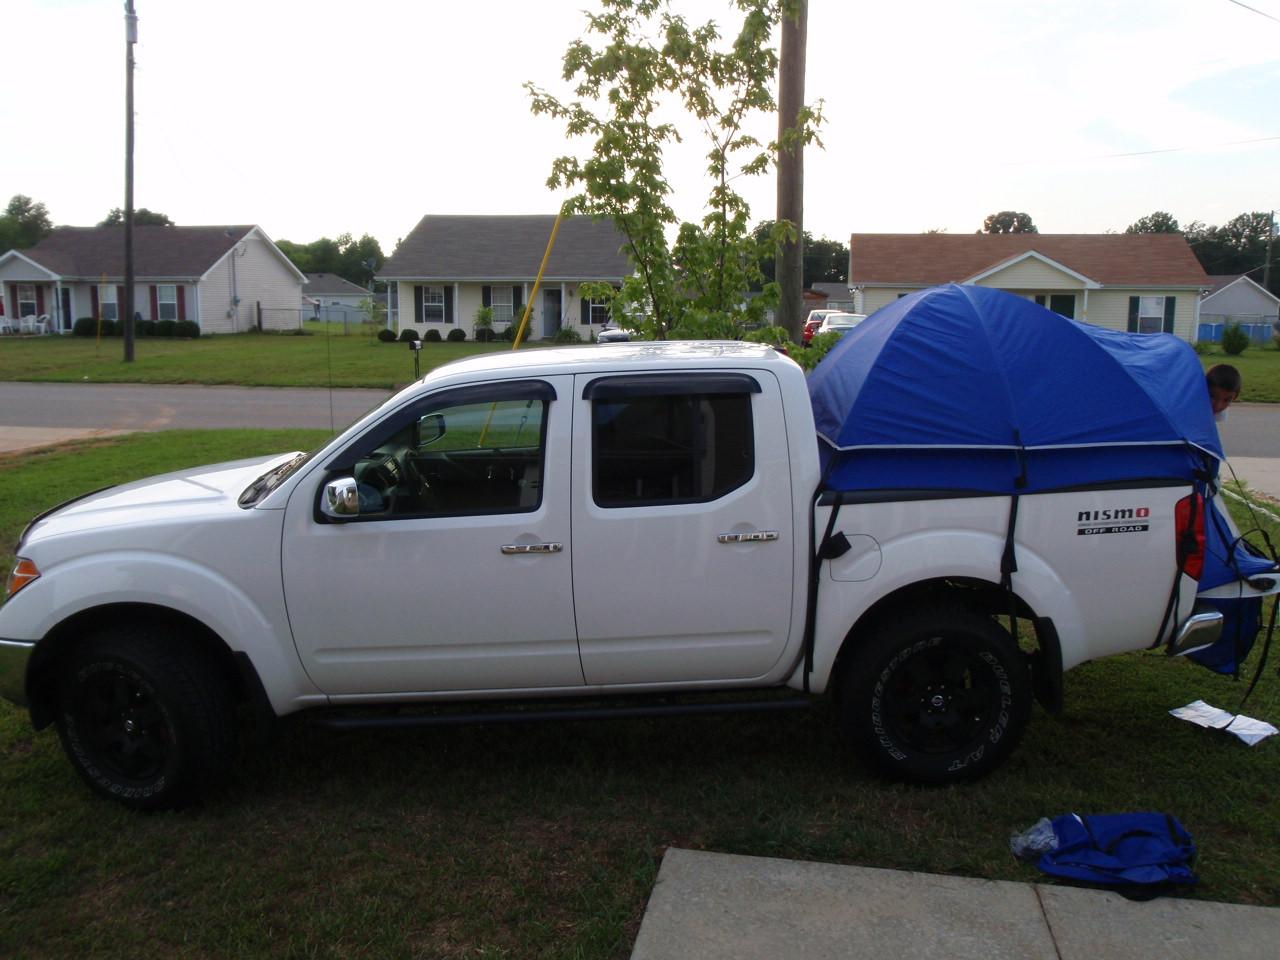 Cc Nissan Bed Tent P7100093 Jpg